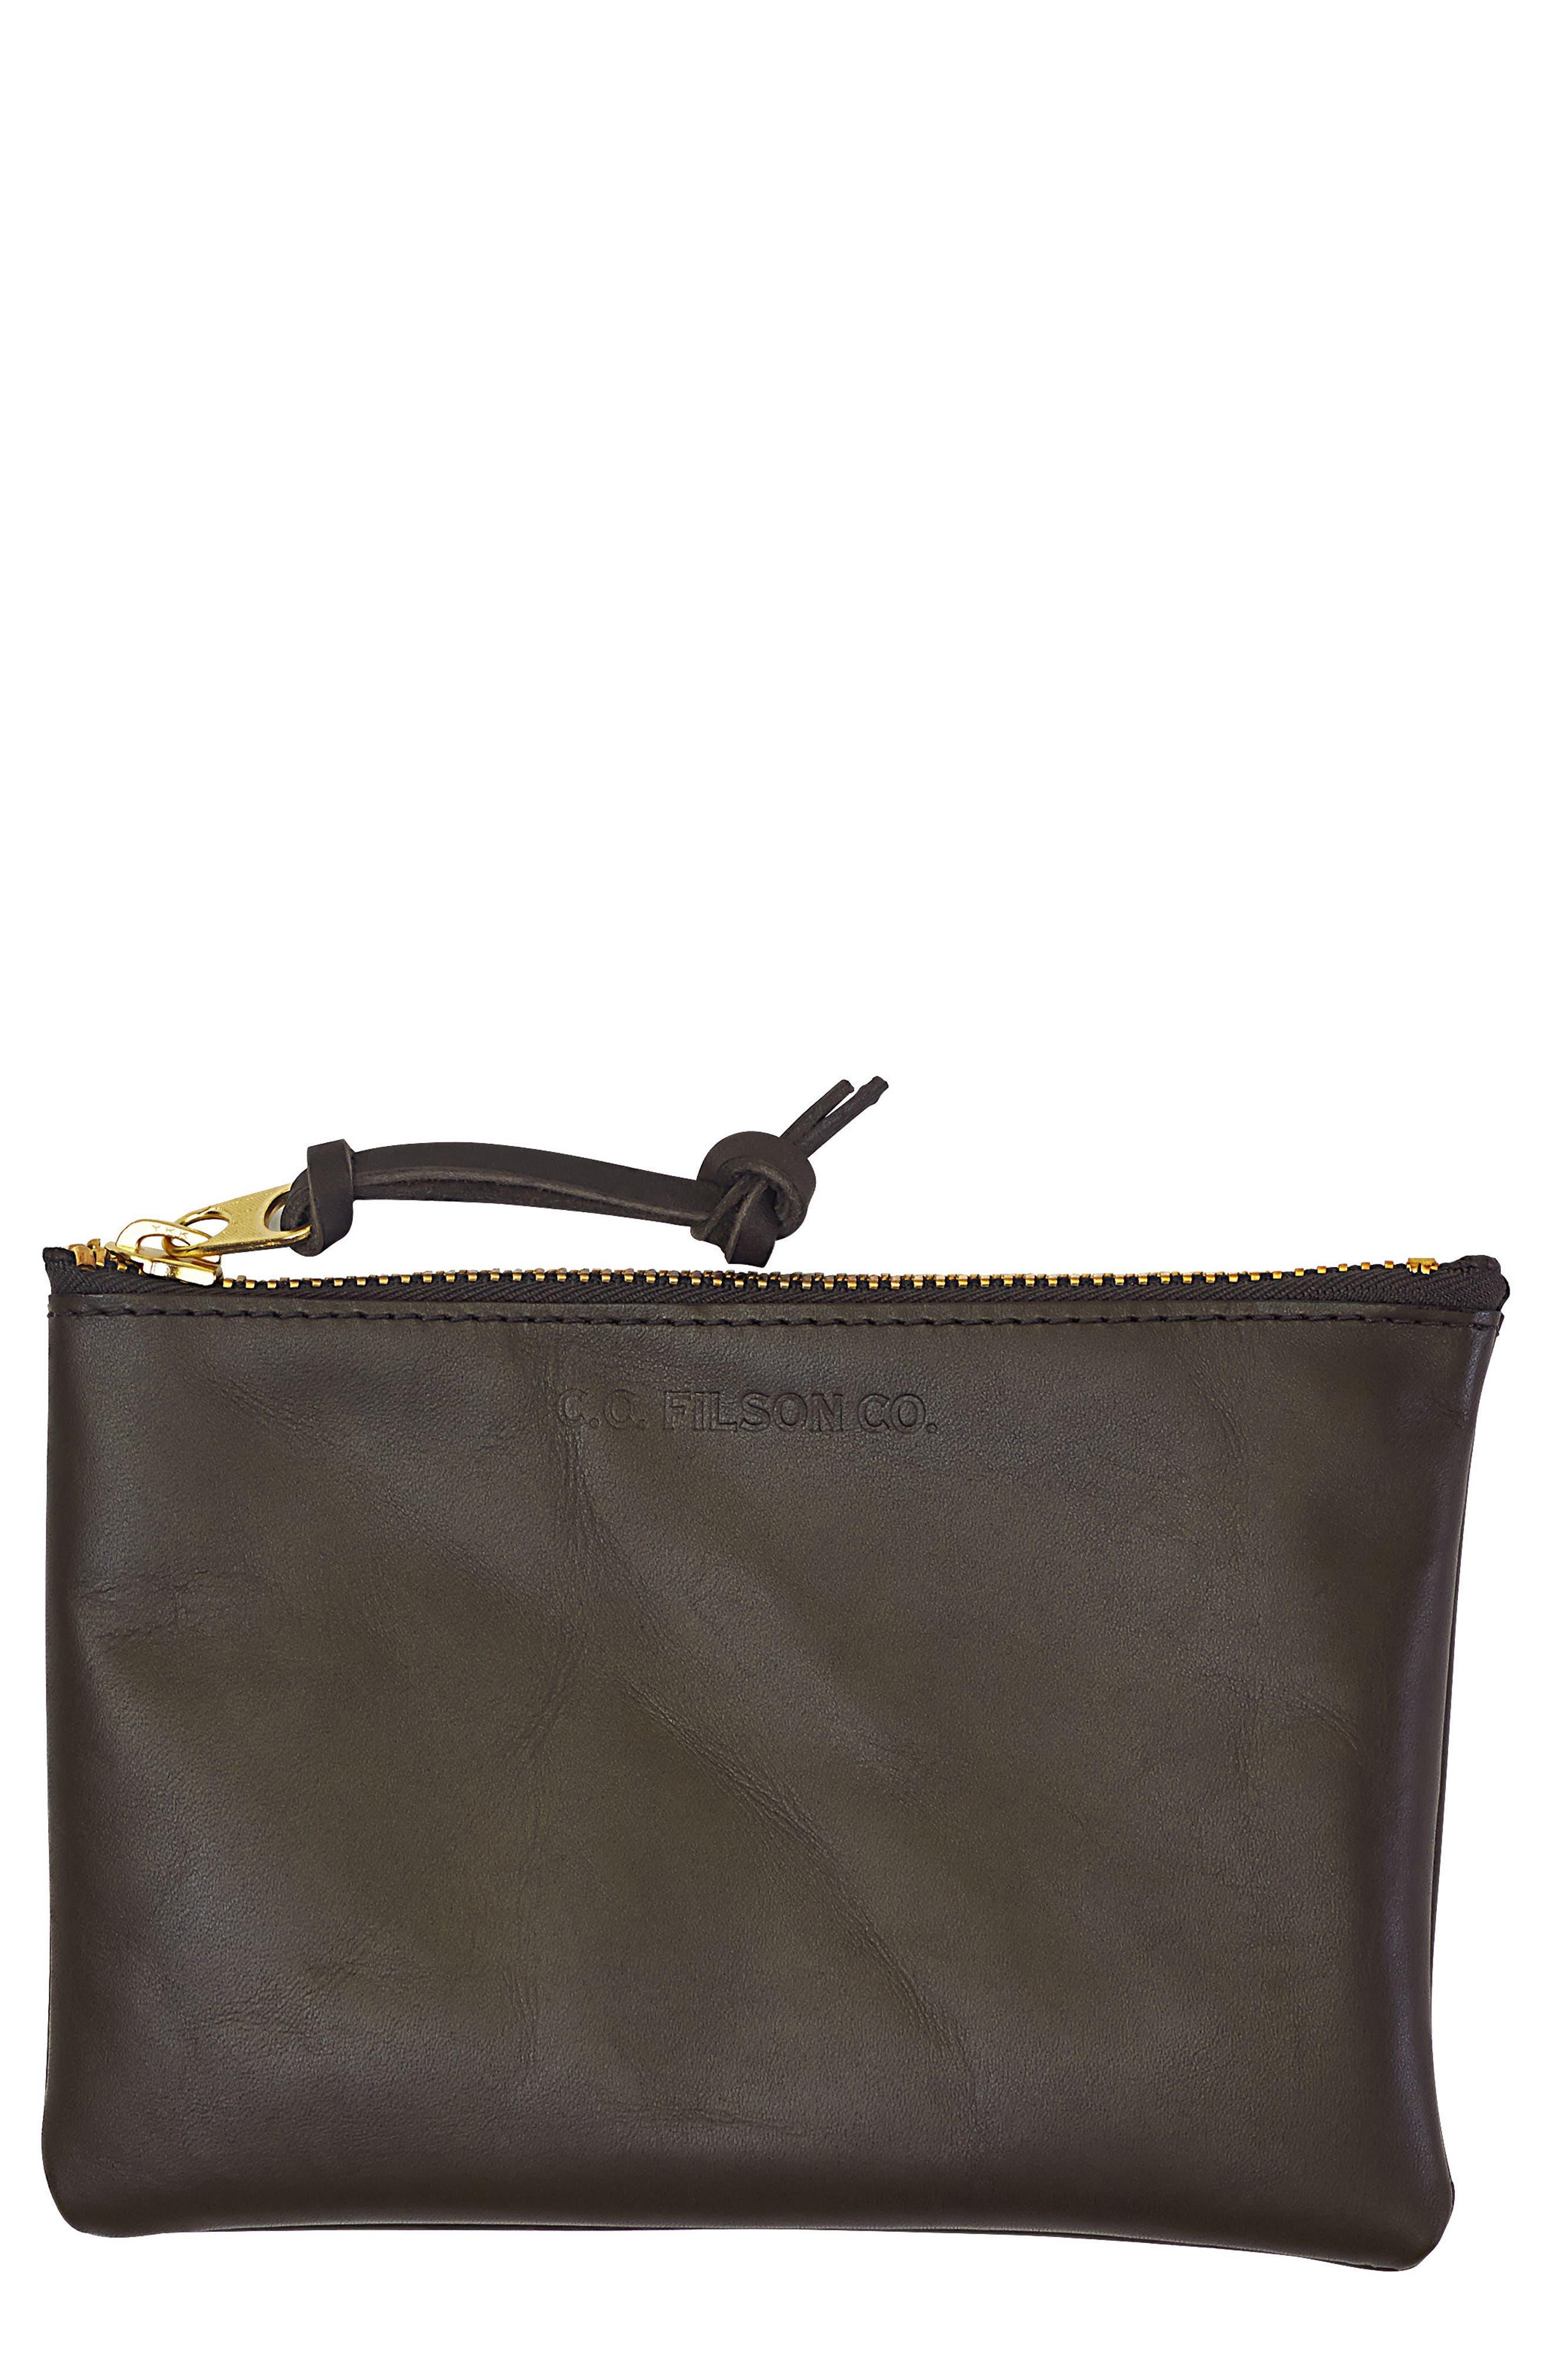 Medium Leather Zipper Pouch,                         Main,                         color, Moss